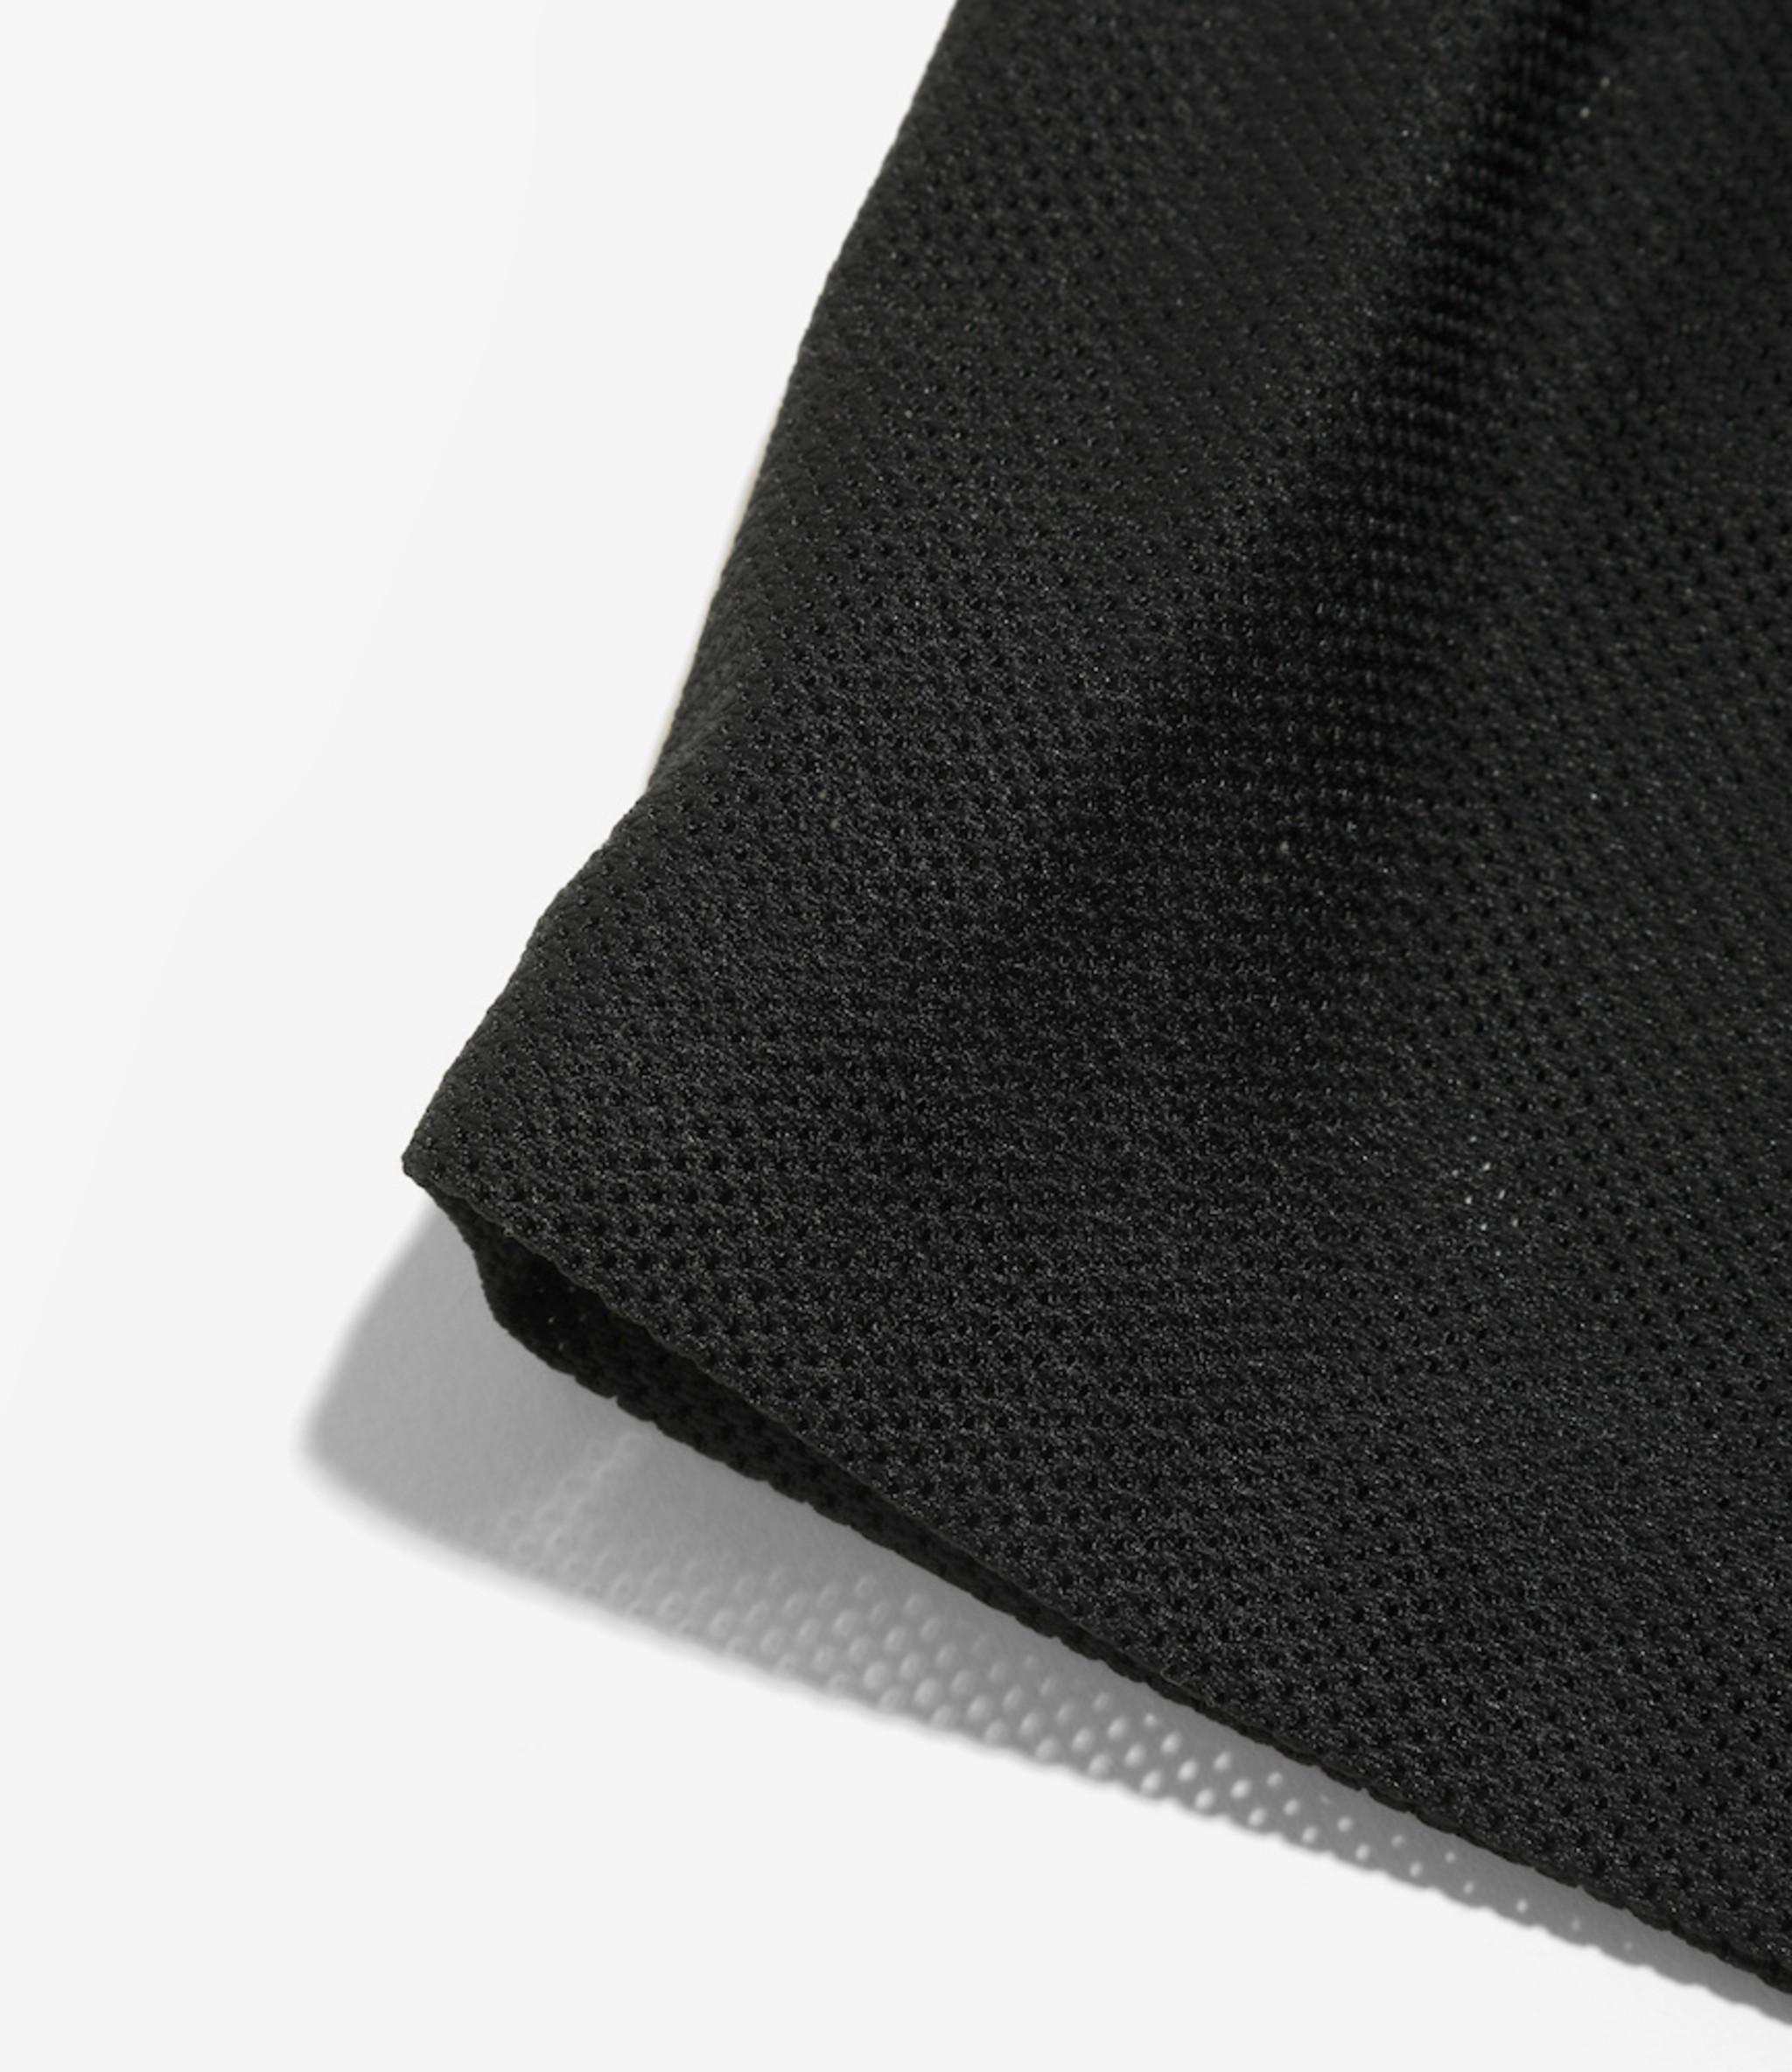 RANDT Studio Pant - Black Koolknit Mesh